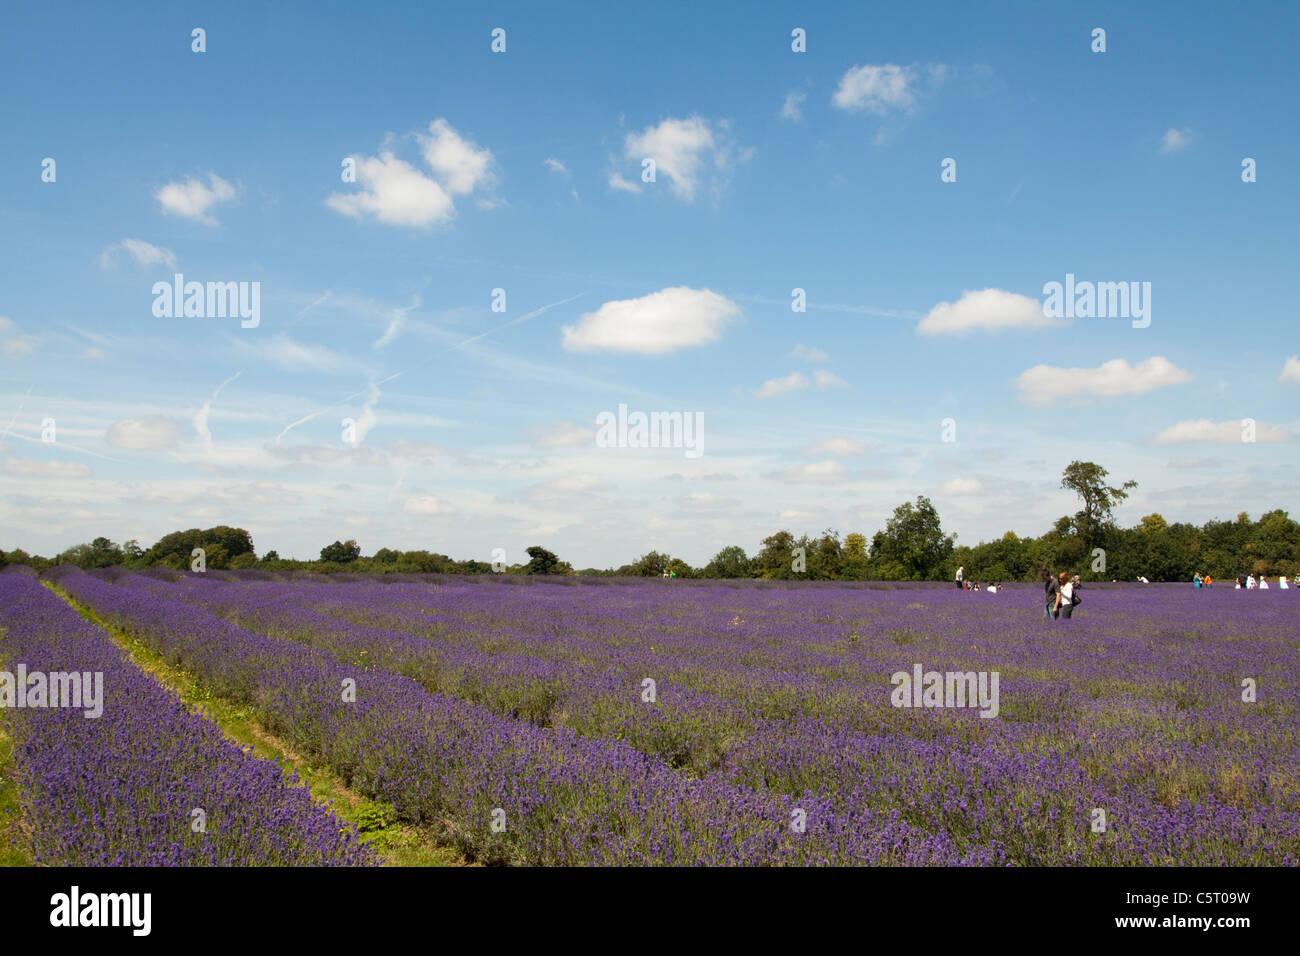 Mayfield Lavender Farm, Banstead, Surrey, England, UK Stockbild